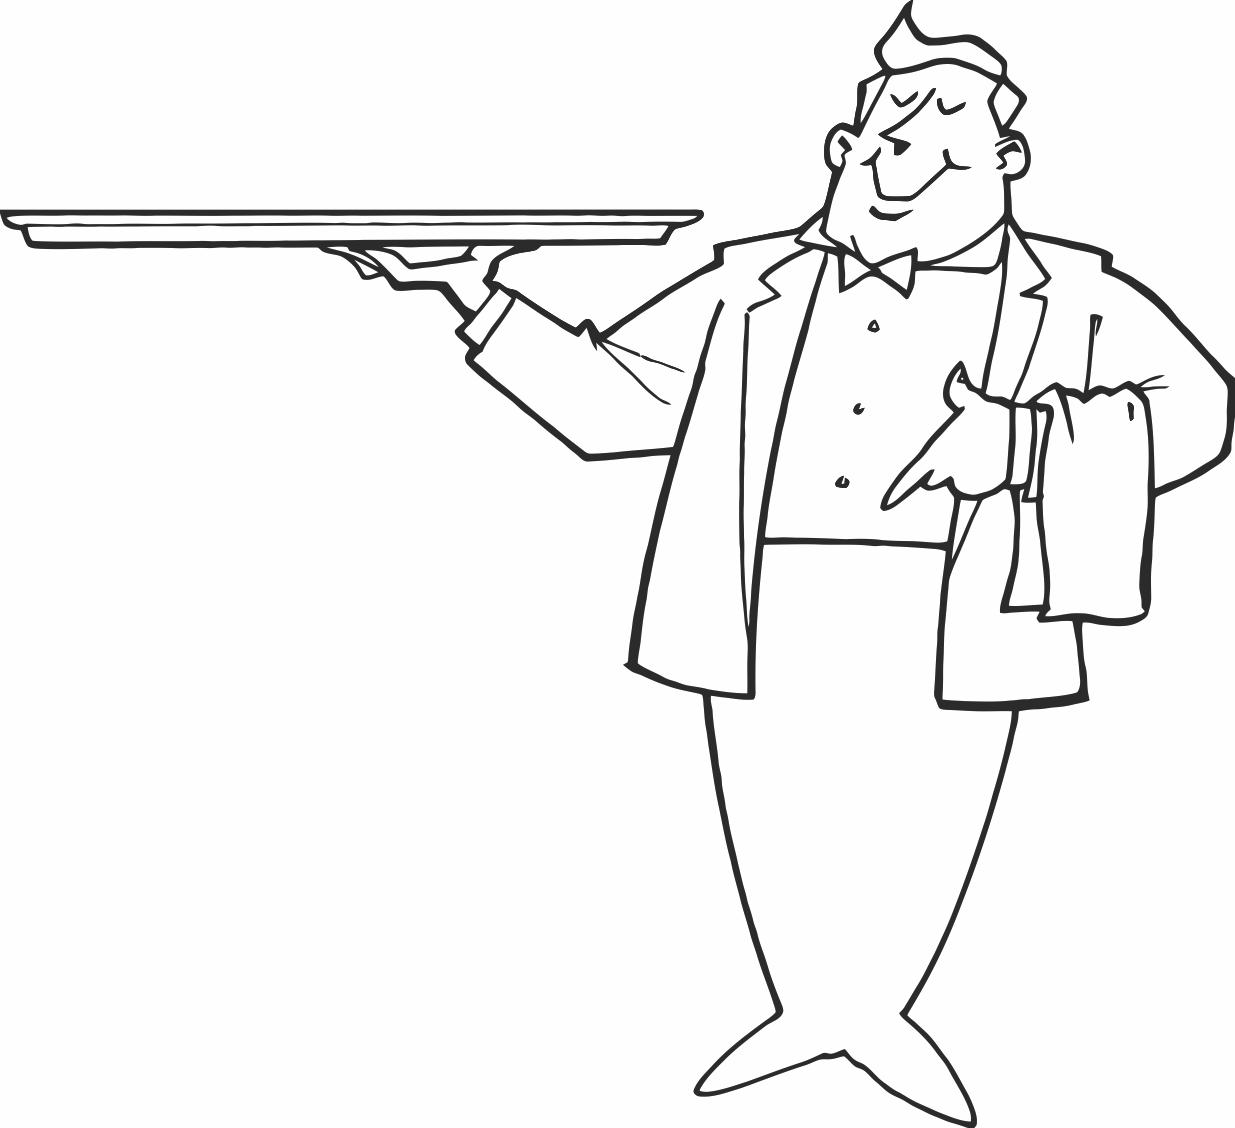 1235x1128 Waiter Holding Tray Printable Image Illustration Sketch For Waiter